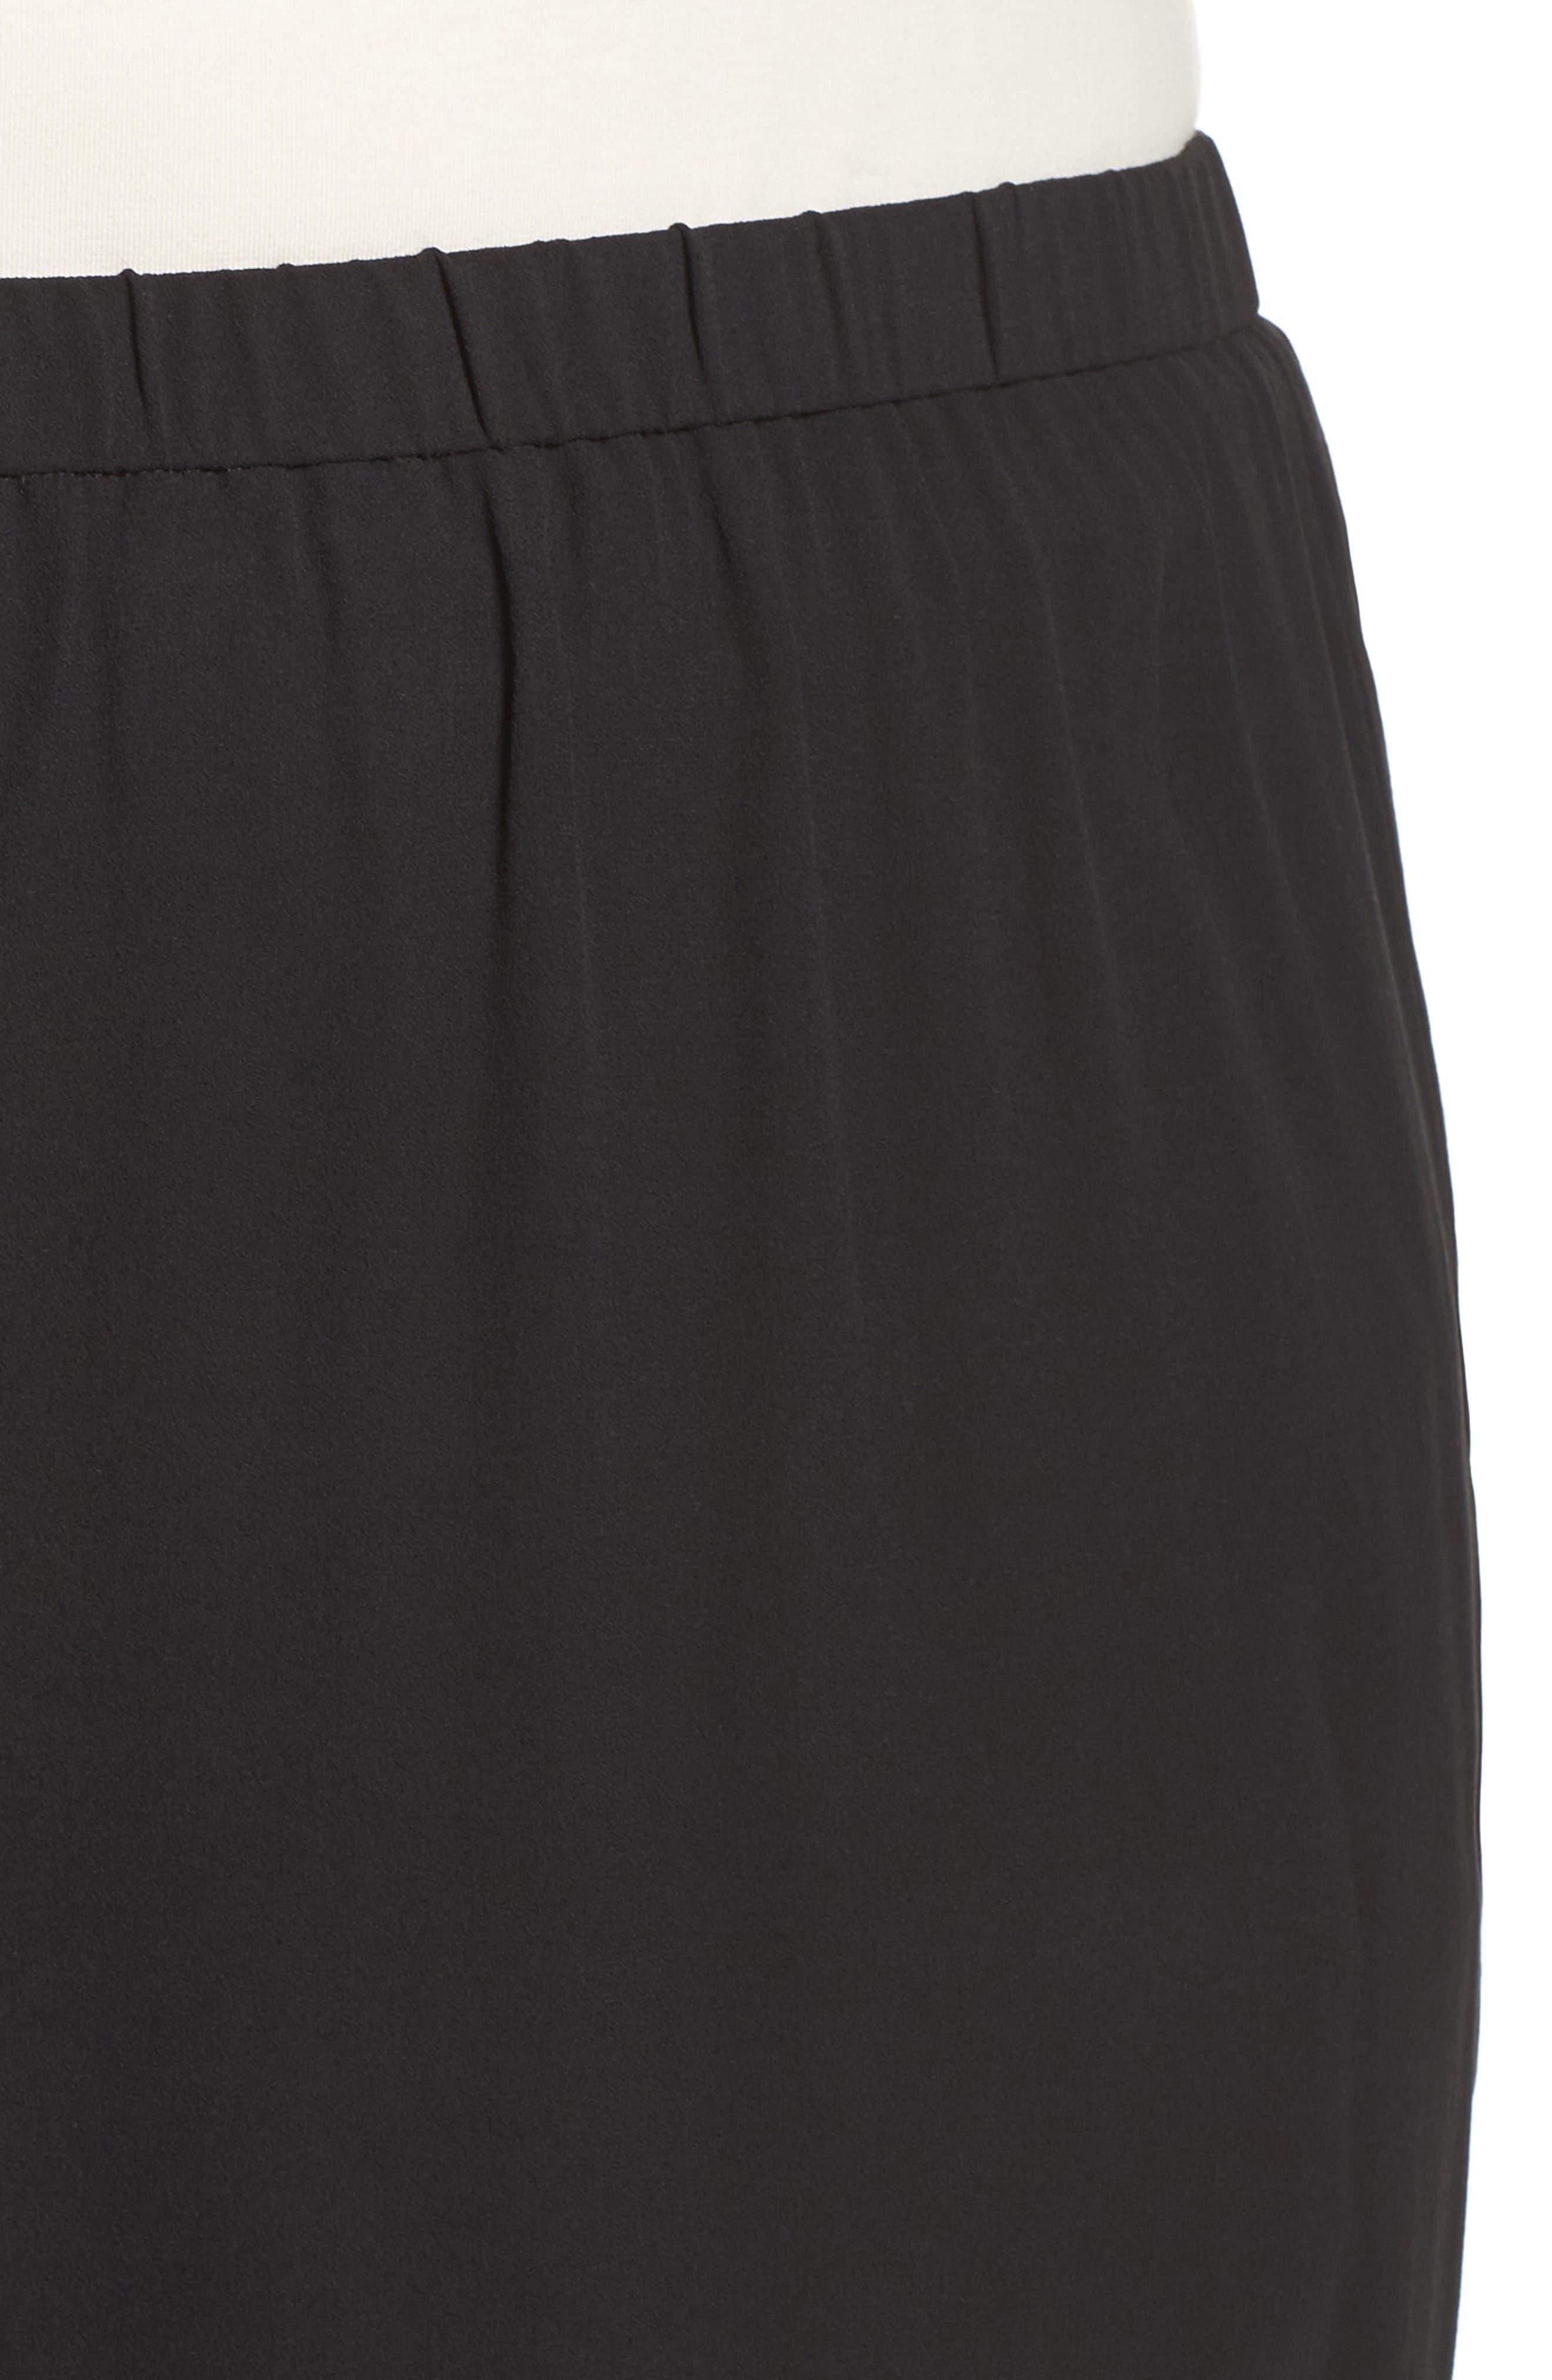 Silk Georgette Crop Pants,                             Alternate thumbnail 4, color,                             Black